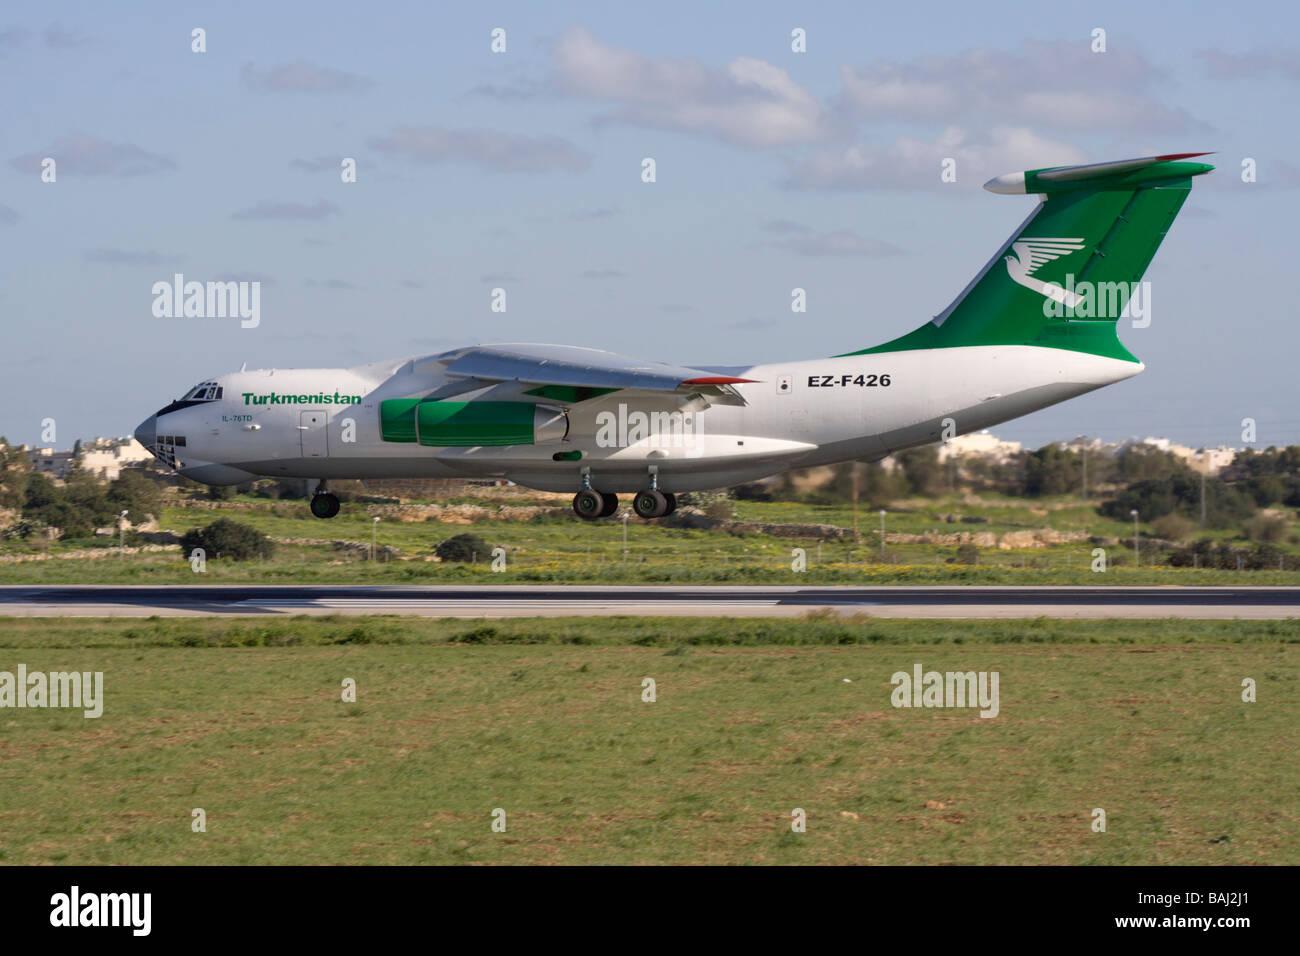 Turkmenistan Airlines Ilyushin Il-76TD landing in Malta - Stock Image